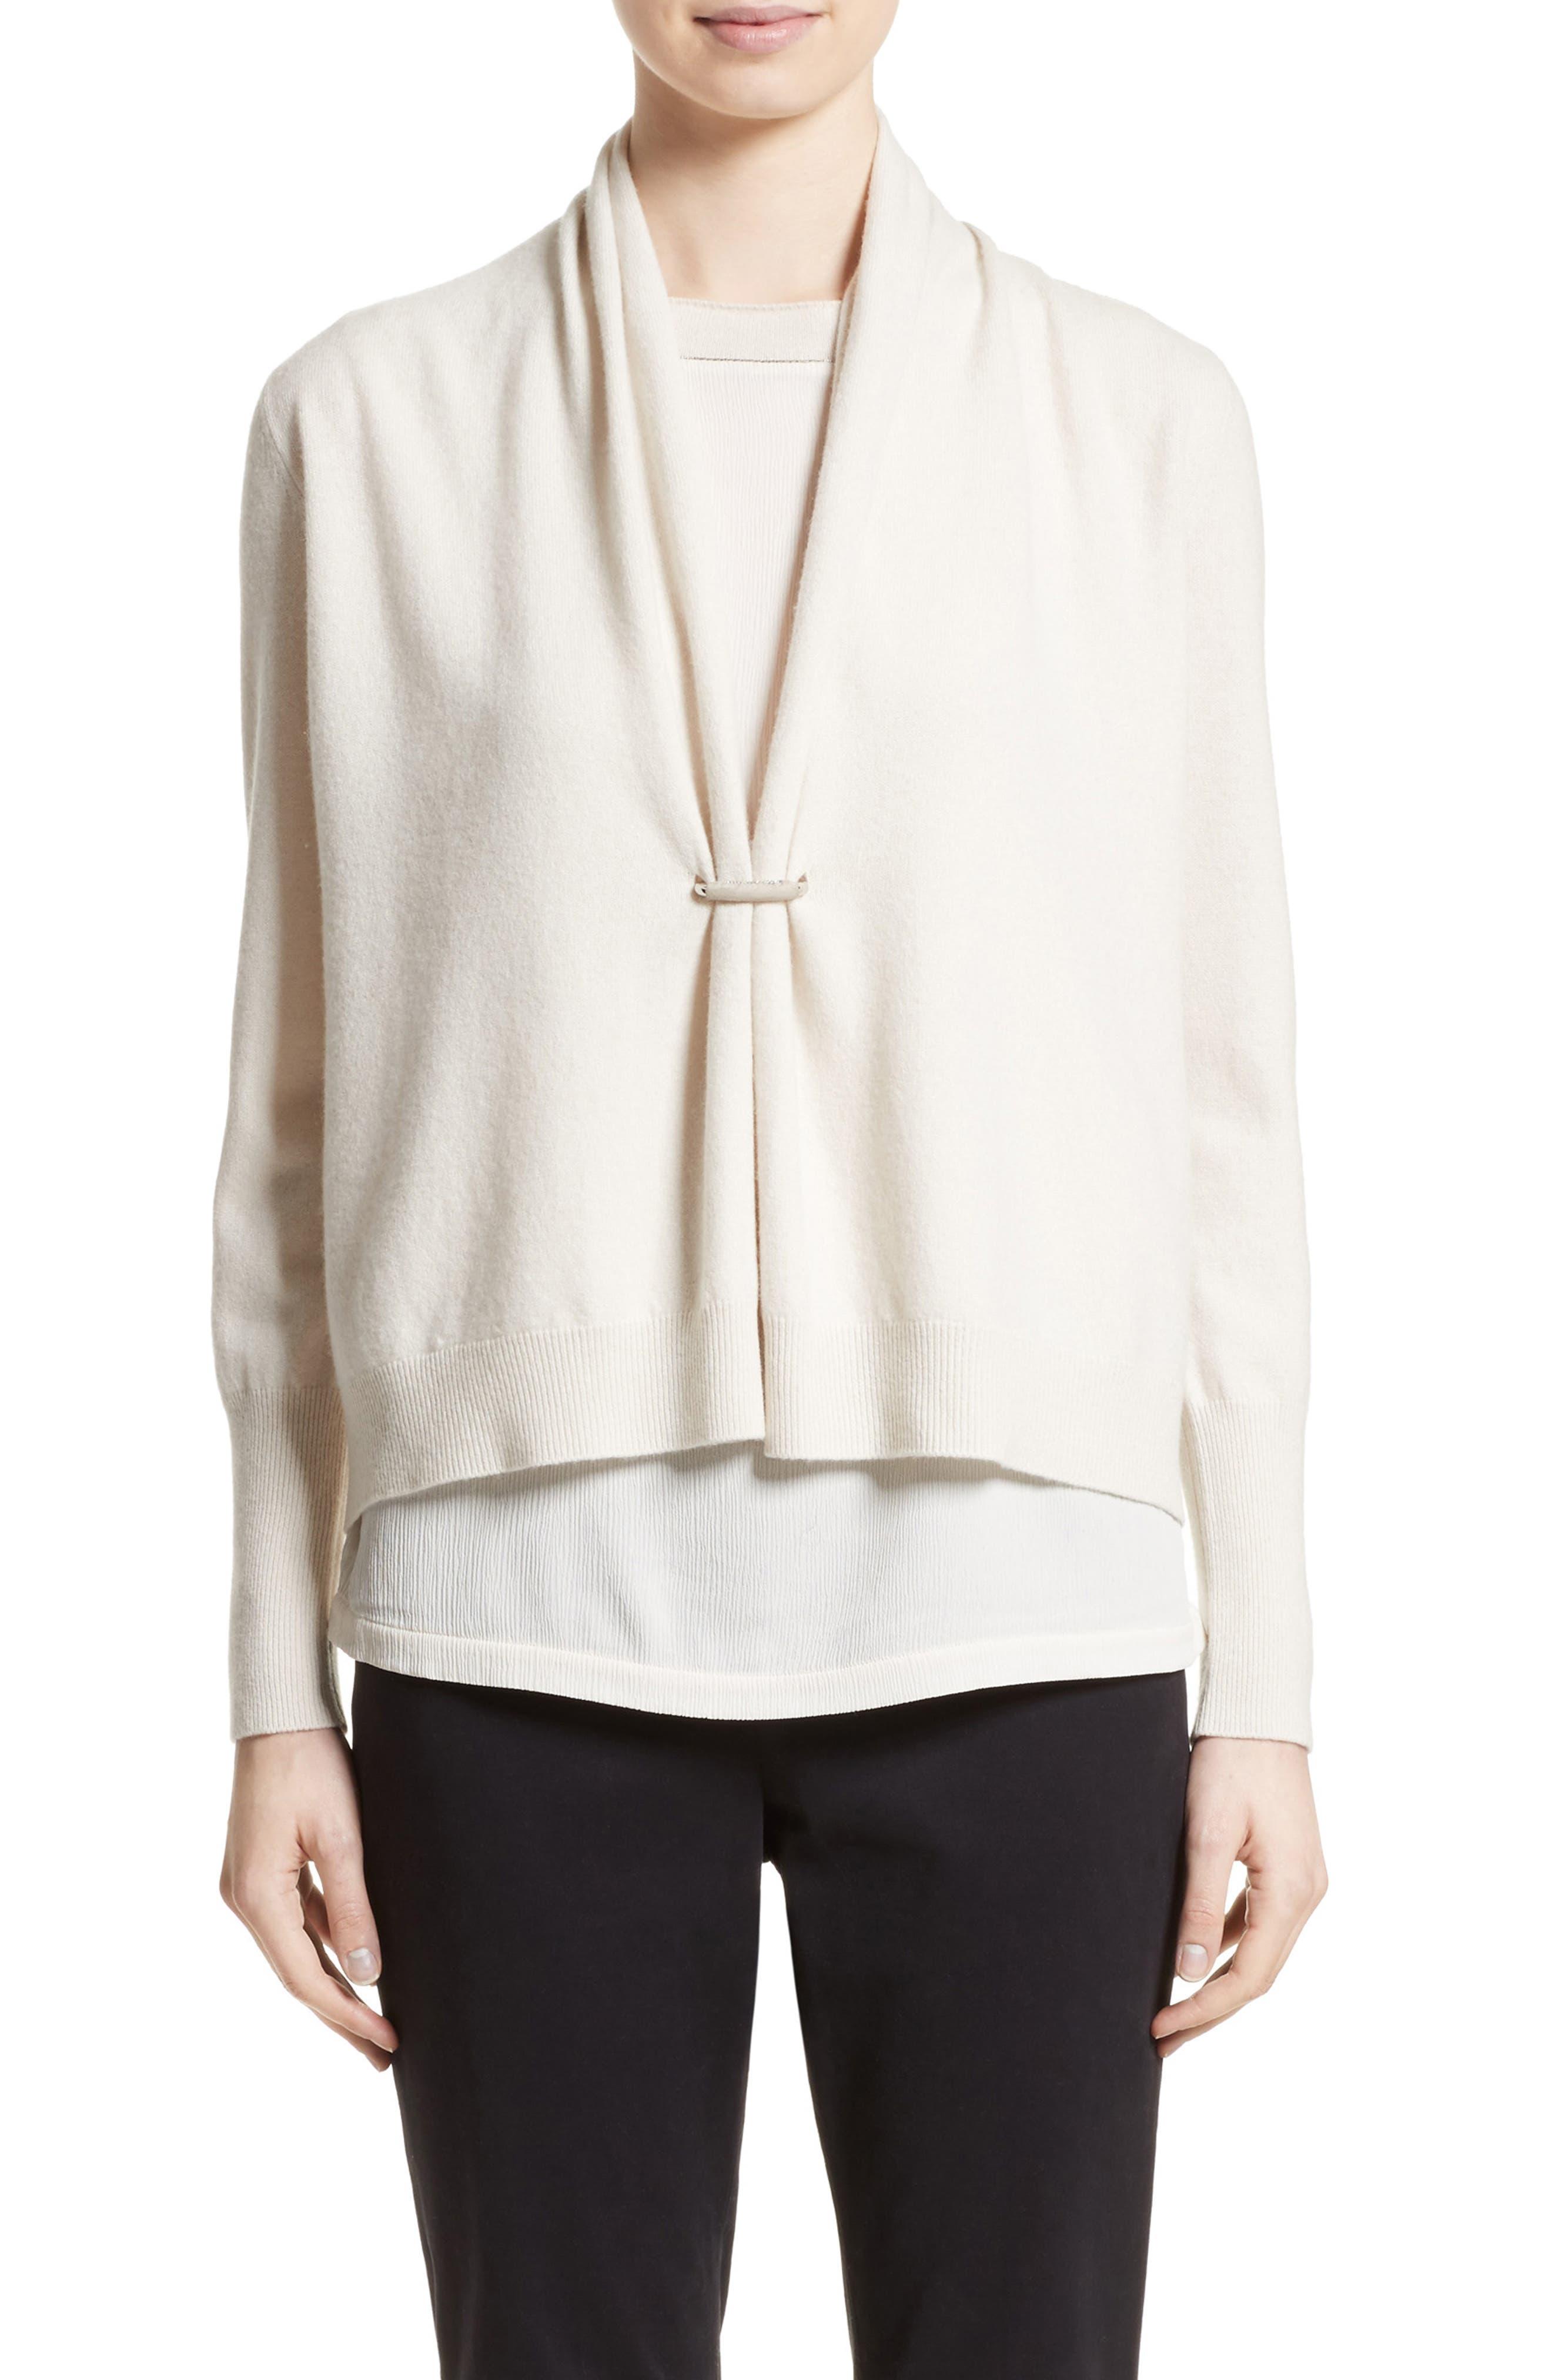 Wool, Silk & Cashmere Shawl Collar Cardigan,                         Main,                         color, 101